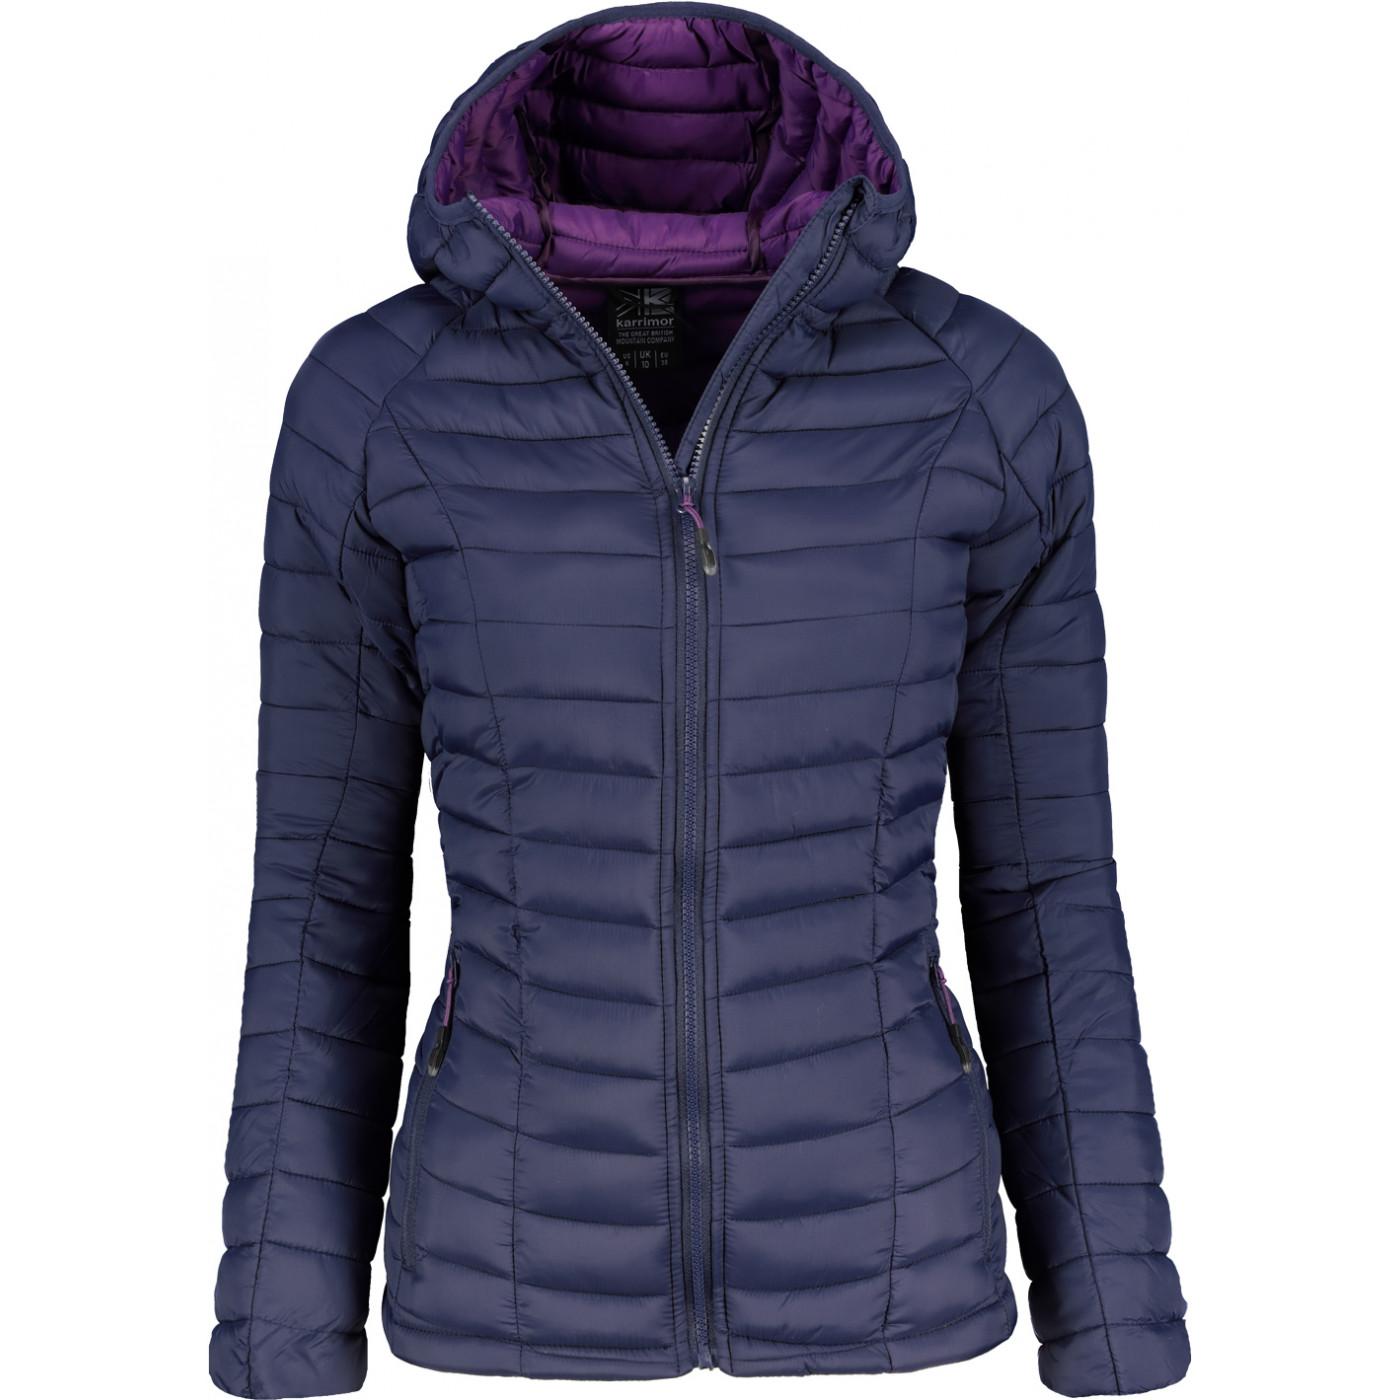 Karrimor Hot Crag Insulated Jacket Ladies